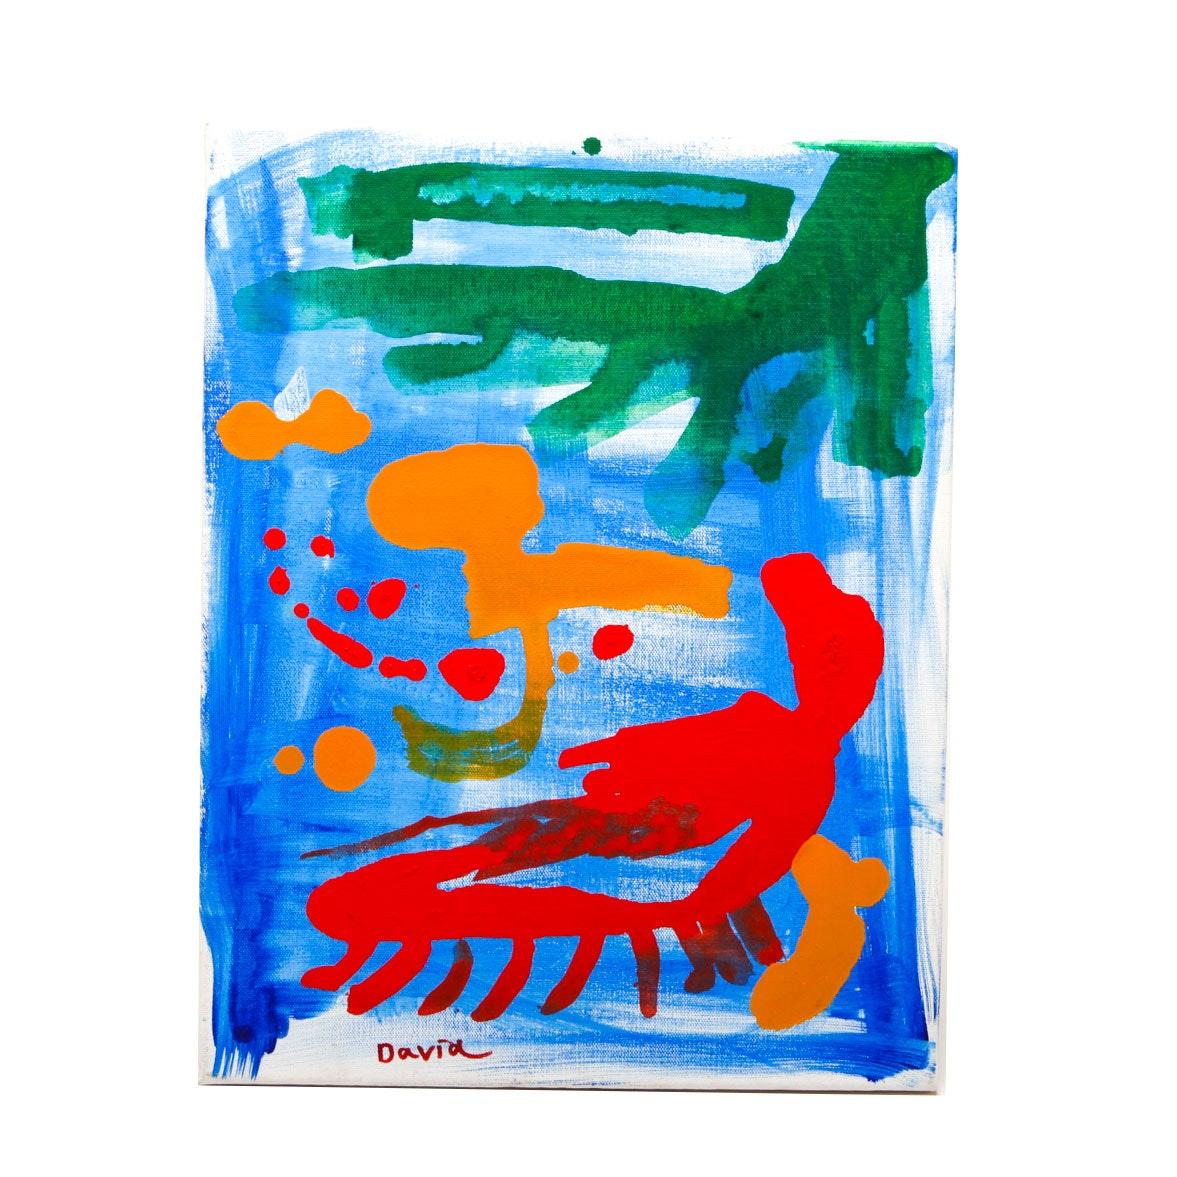 David Gossard Original Acrylic Painting on Canvas